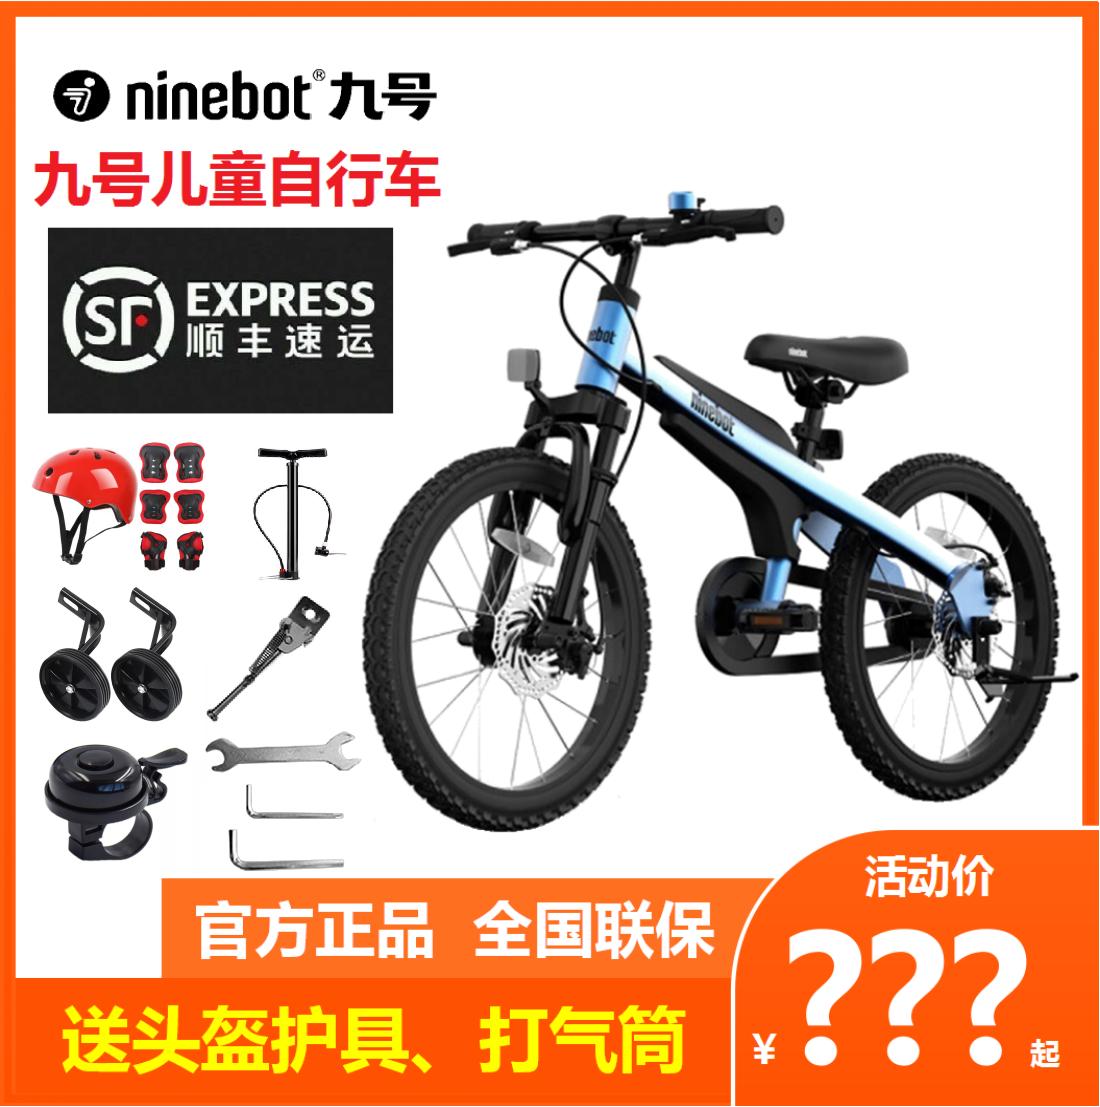 ninebot童车九号儿童小米岁自行车